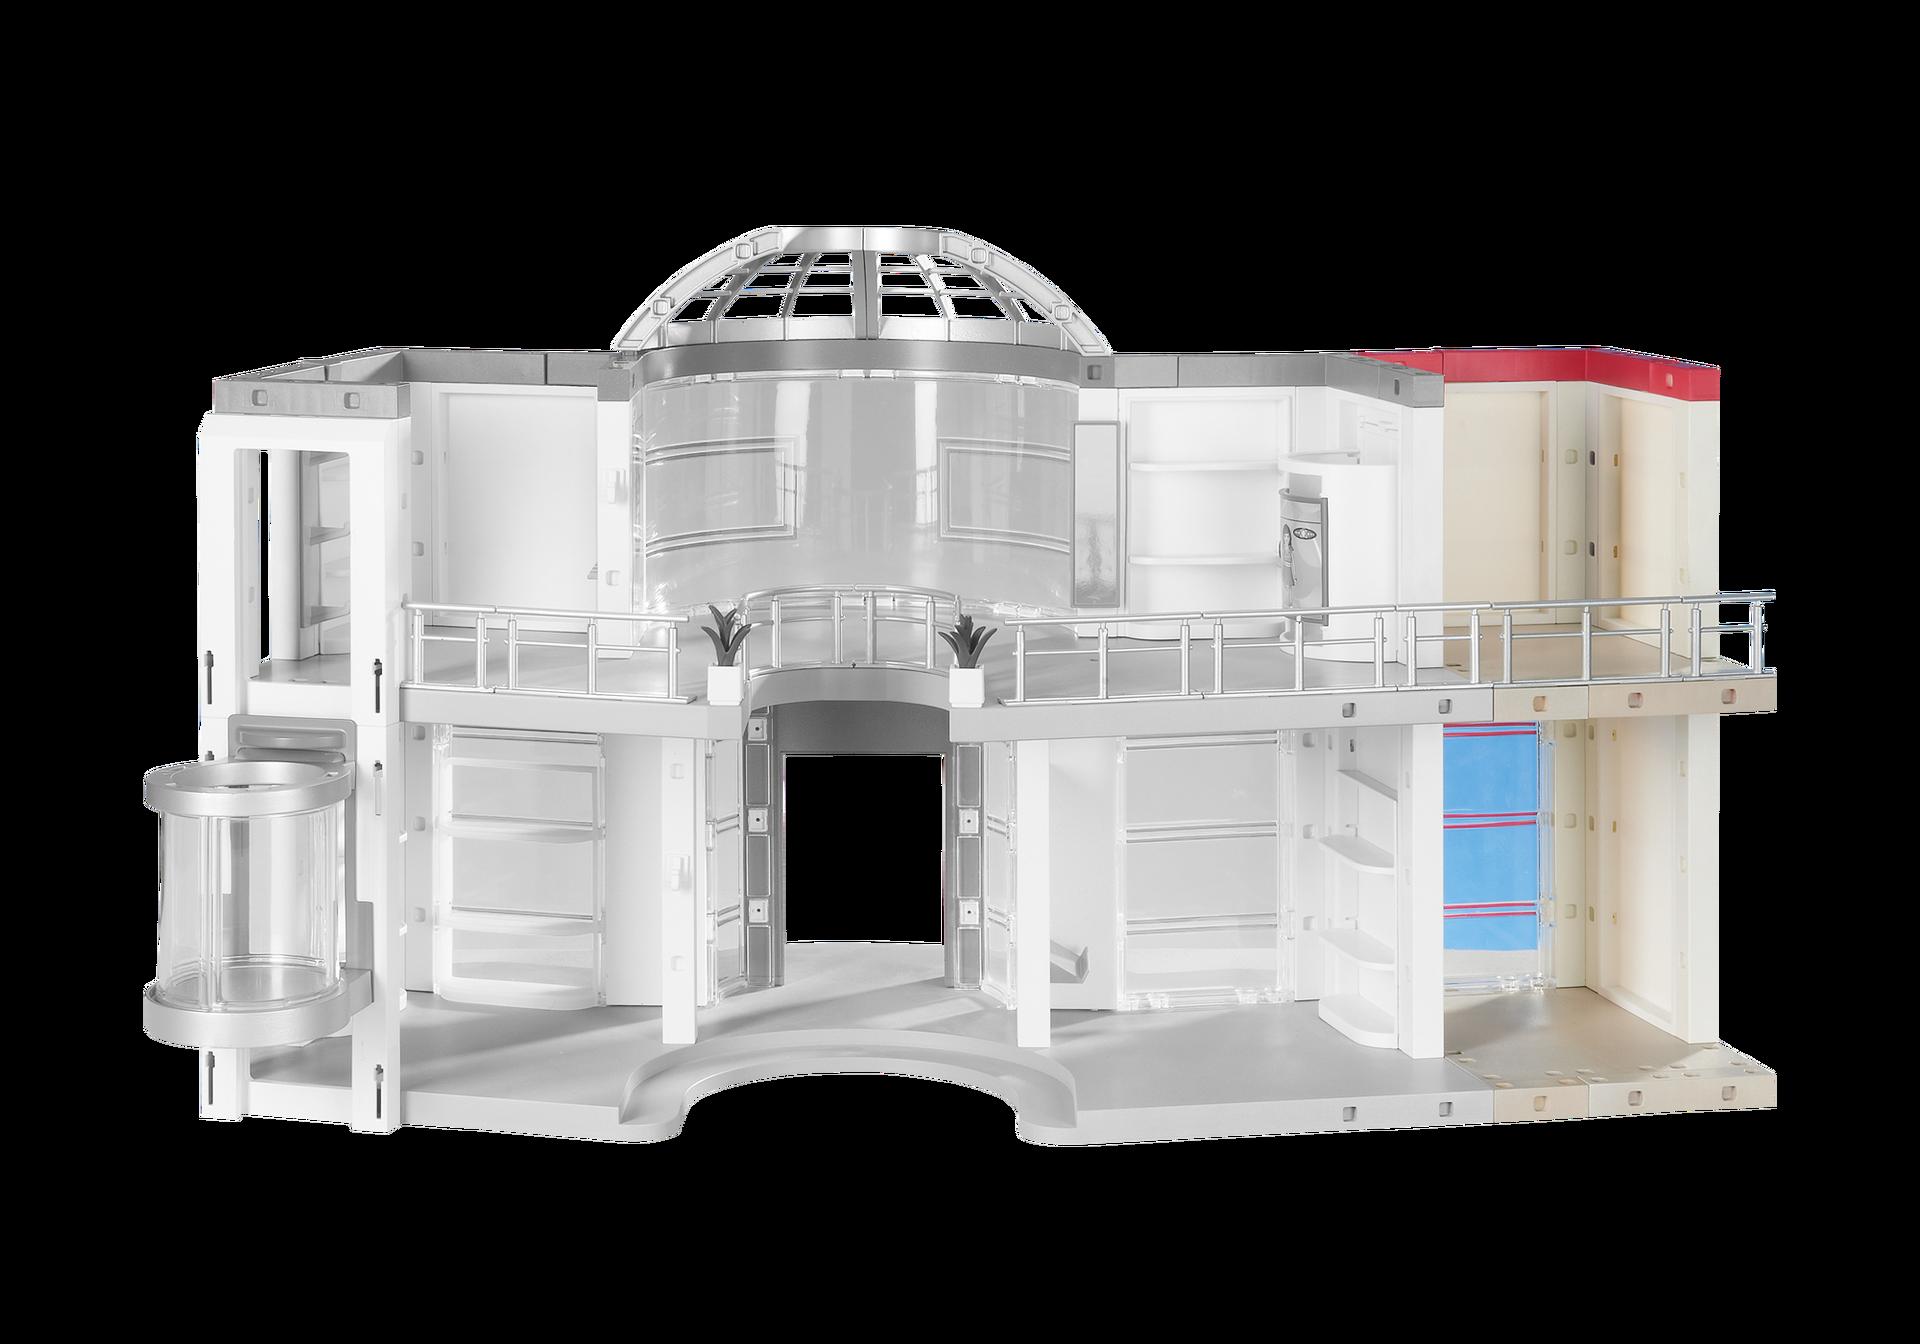 agrandissement pour le grand magasin am nag 6333 playmobil belgi. Black Bedroom Furniture Sets. Home Design Ideas